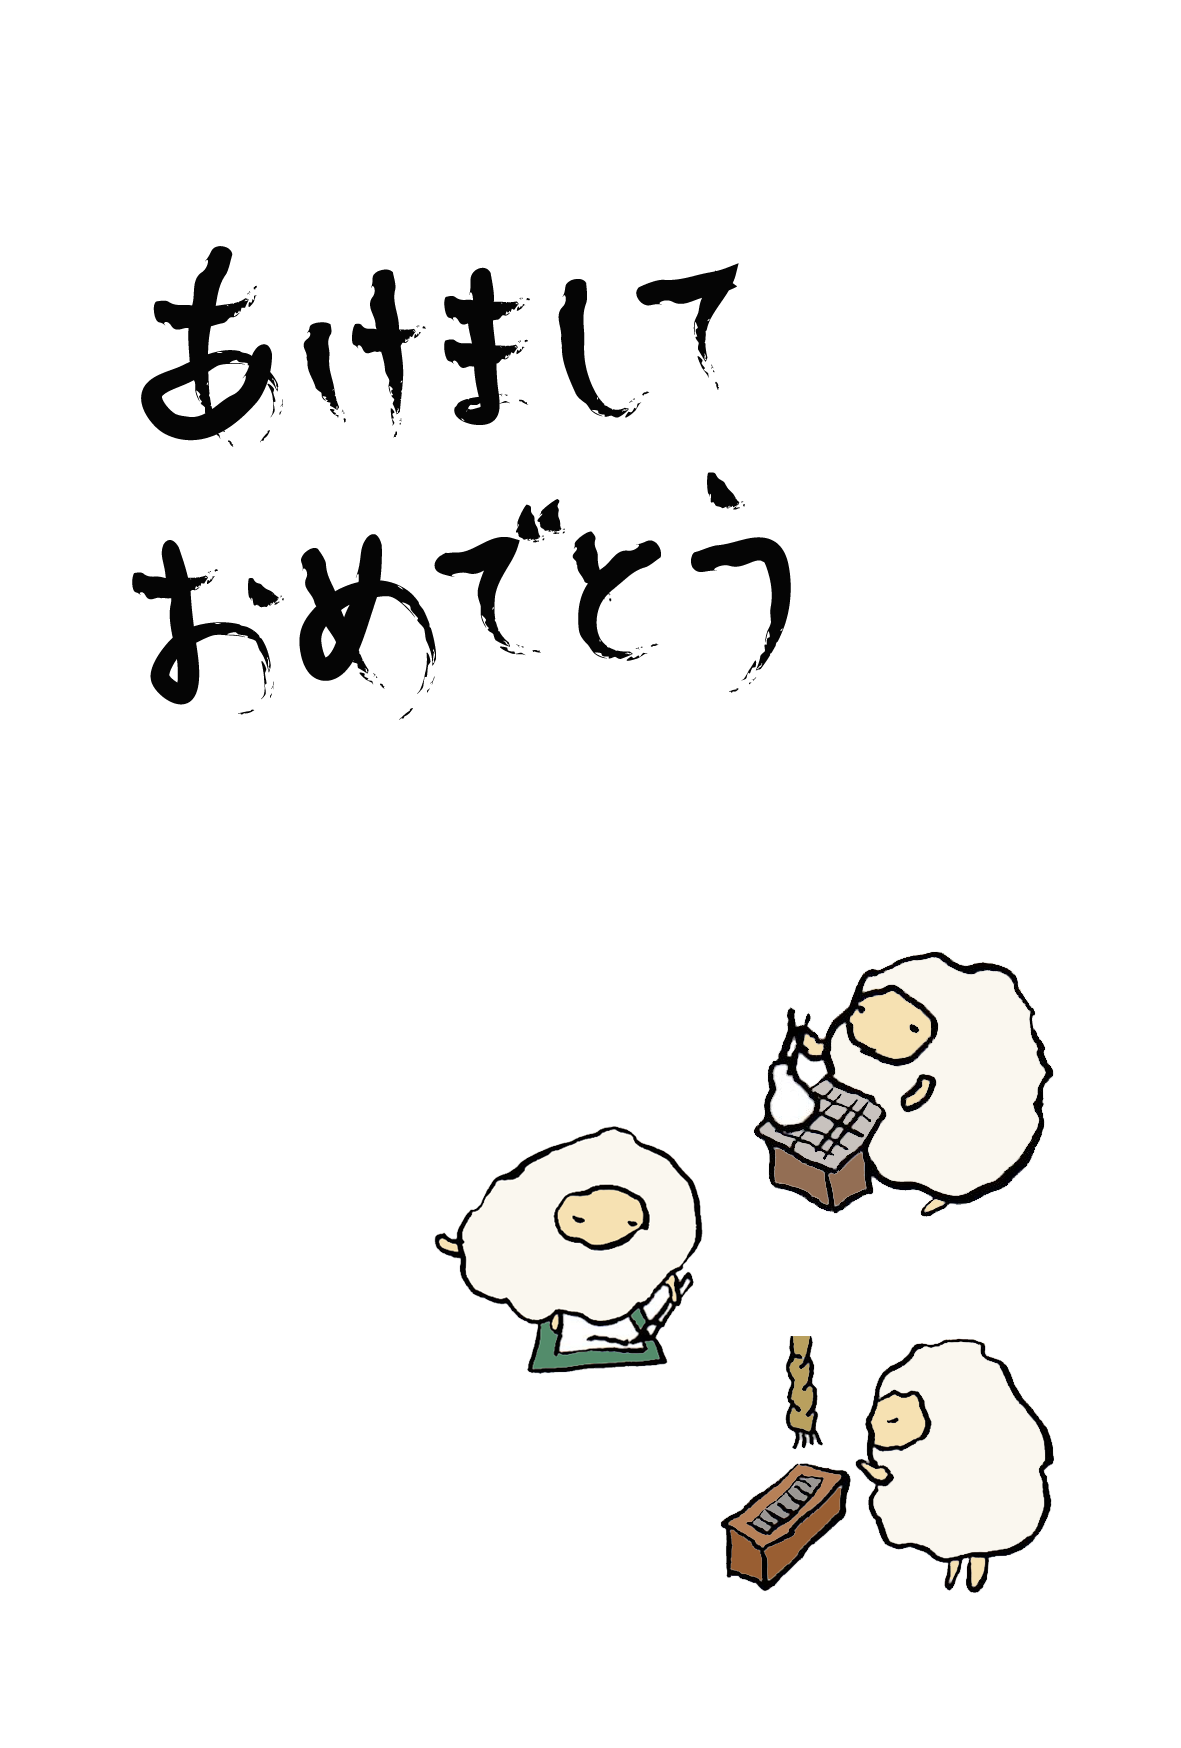 ... (羊)<無料>-和風 : 年賀状 デザイン 無料 羊 : 年賀状